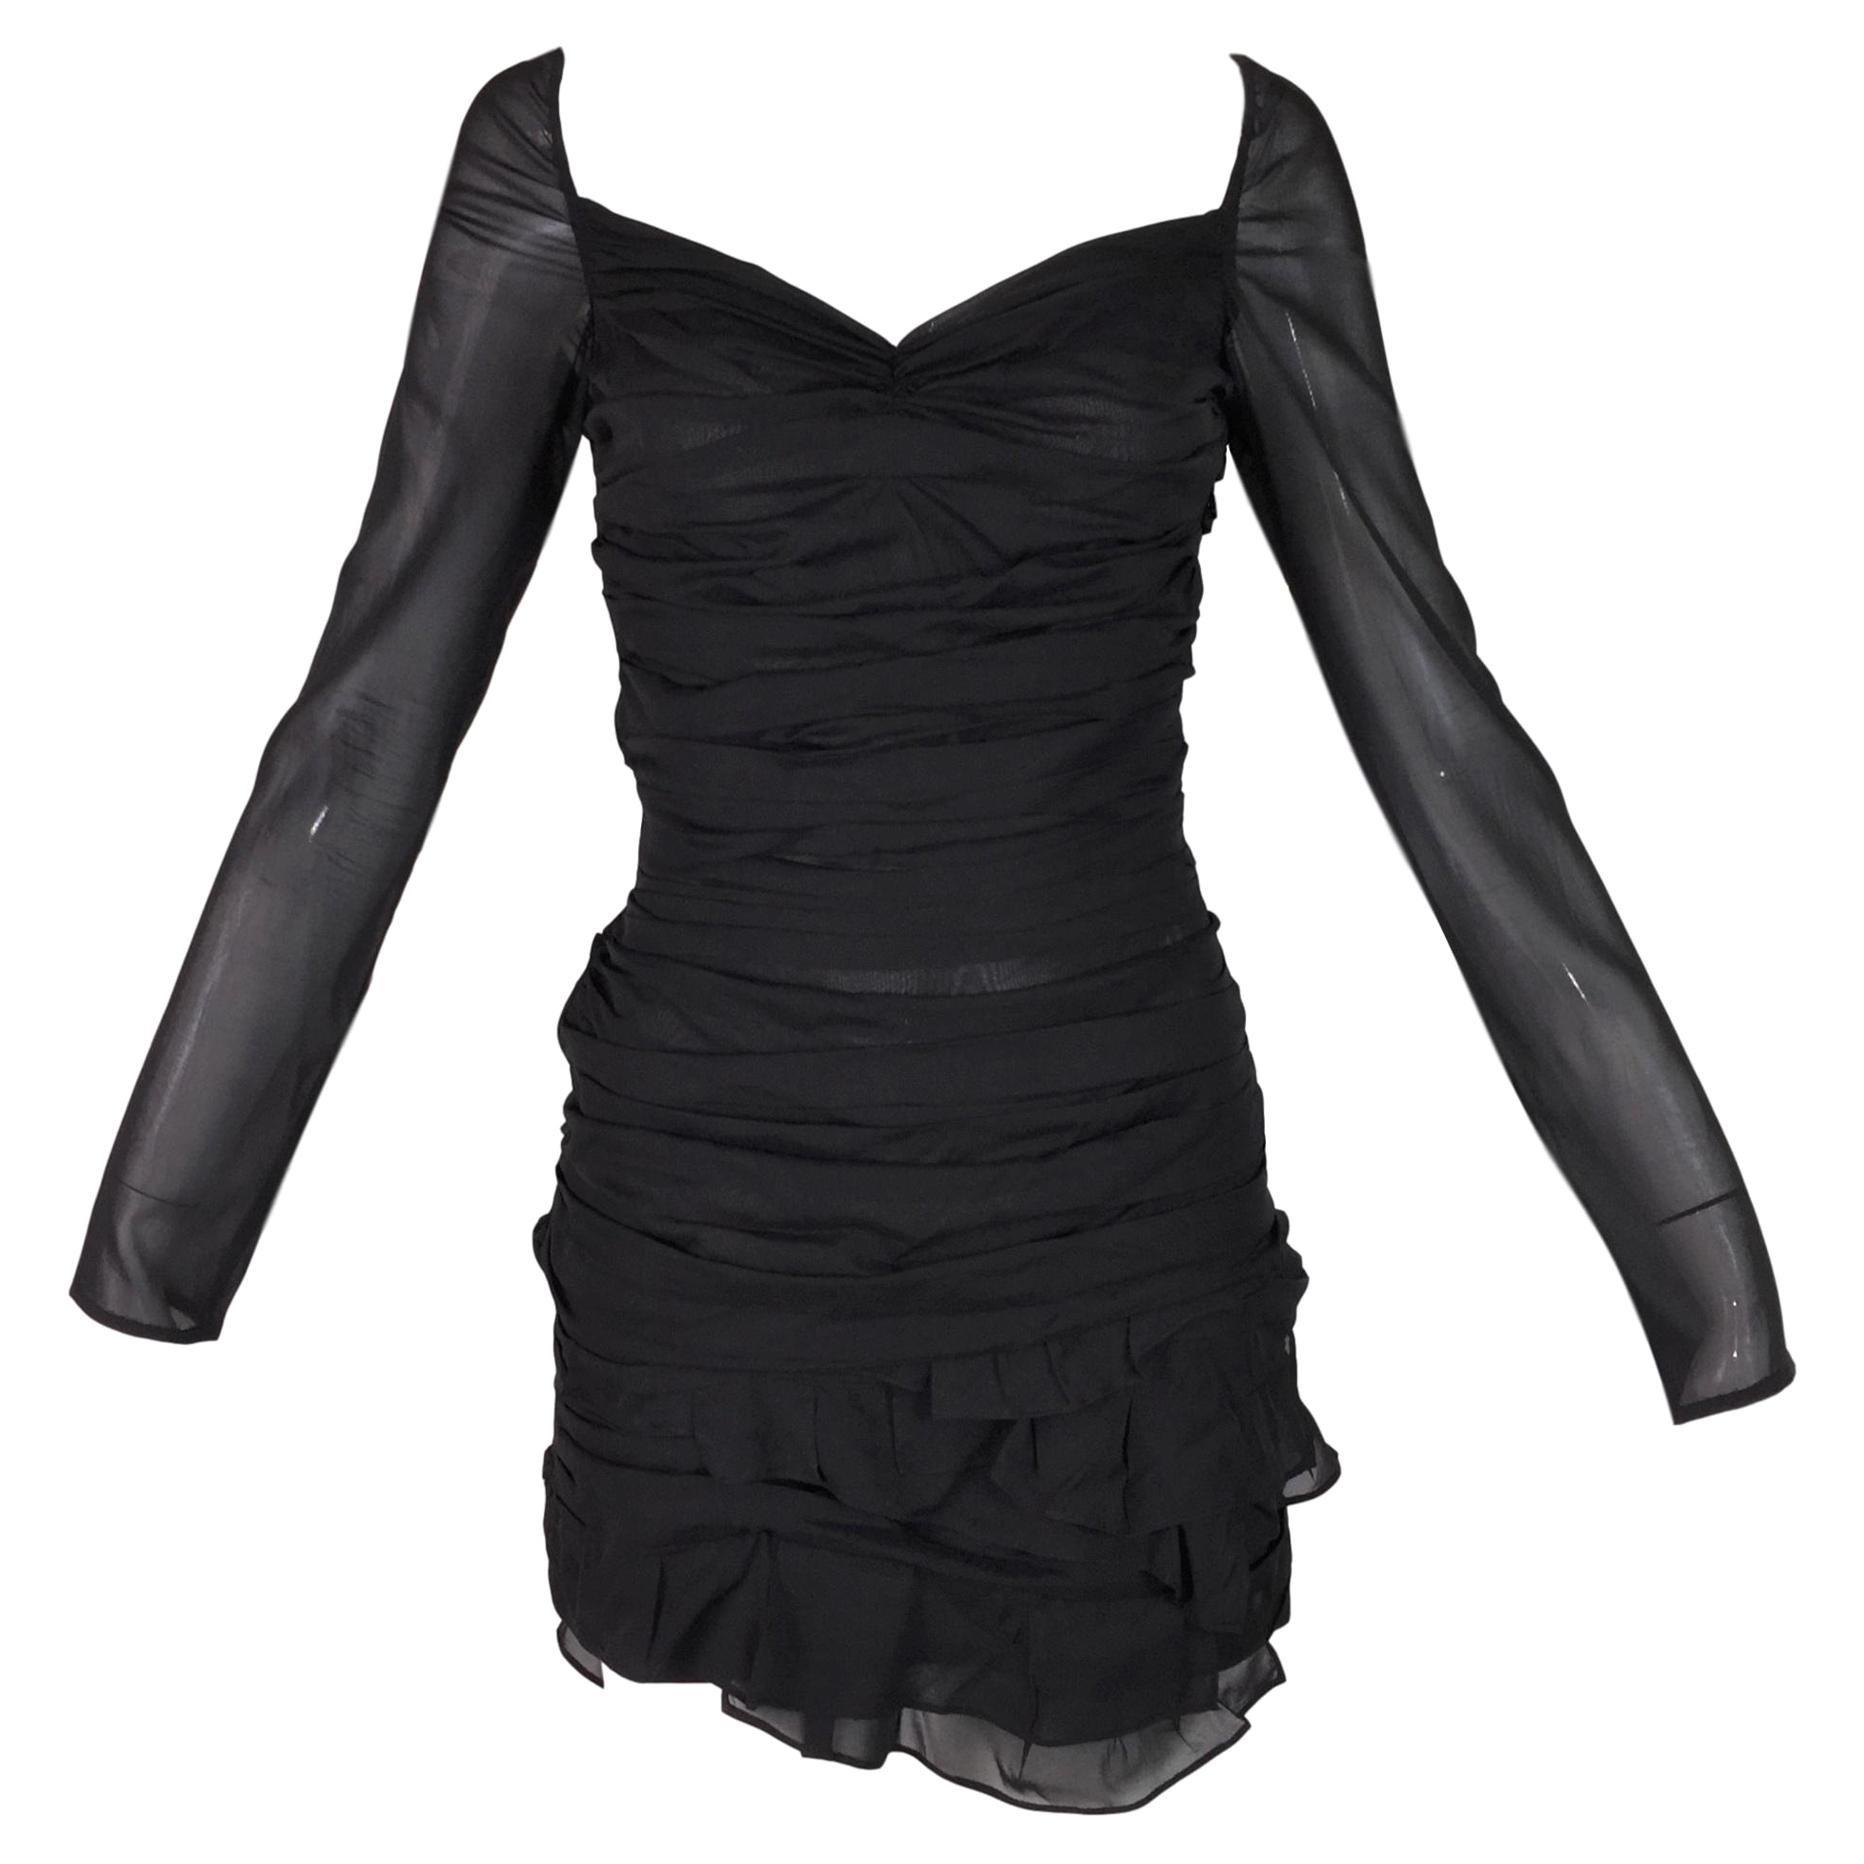 c8e34529b32 S/S 2003 Gucci Tom Ford Runway Black Silk Ruched Sheer L/S Mini Dress at  1stdibs